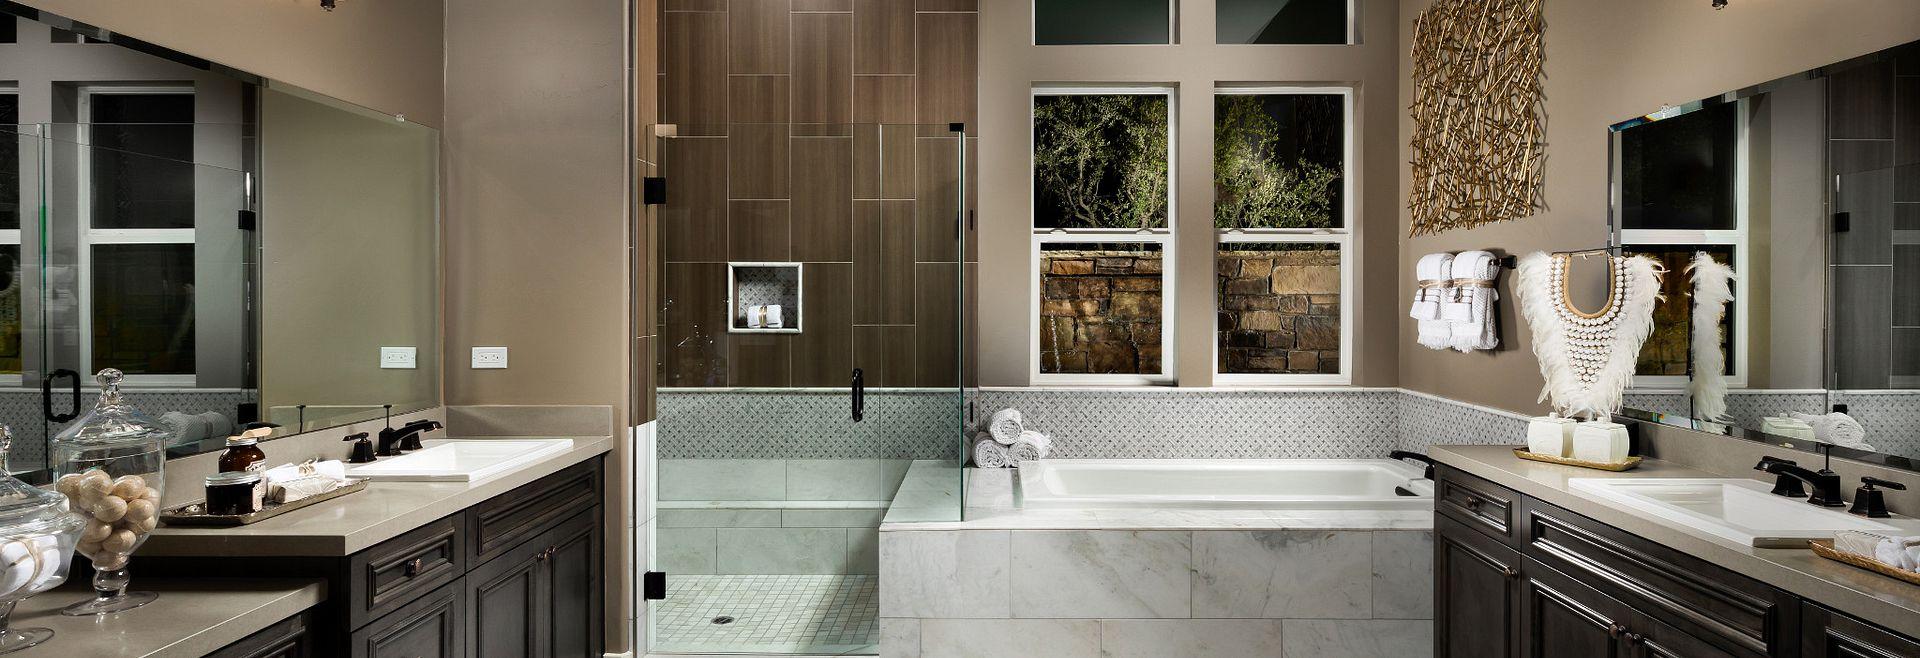 Trilogy Monarch Dunes Dolcetto Master Bath